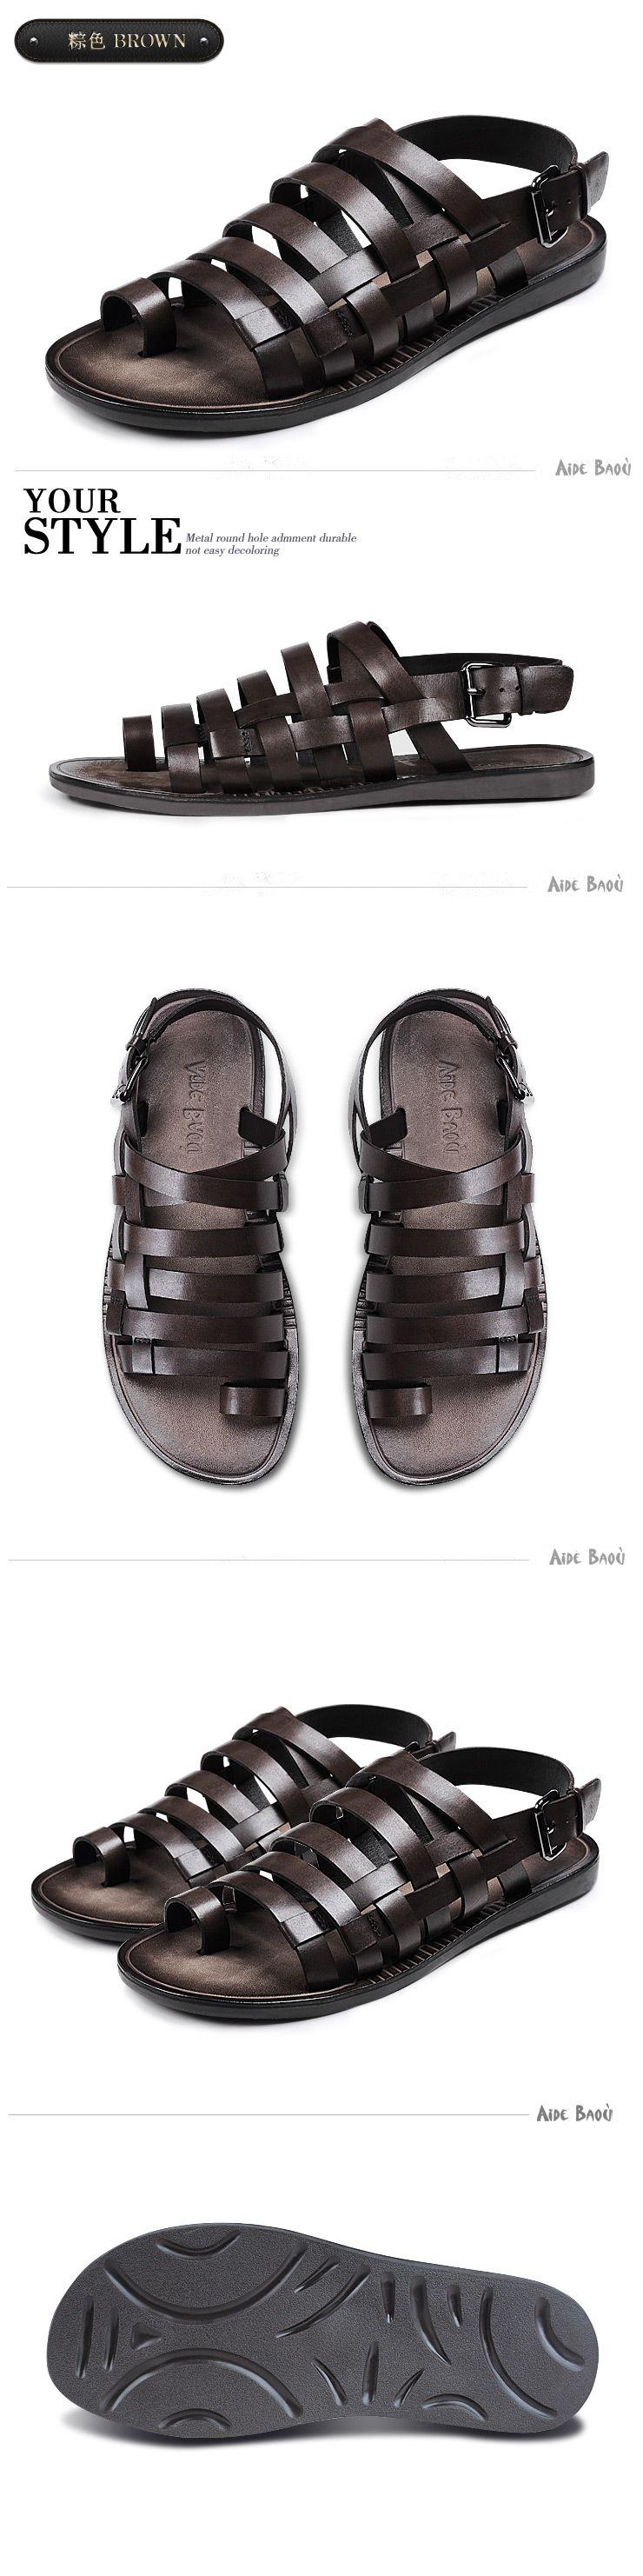 Mens leather sandals, Mens sandals